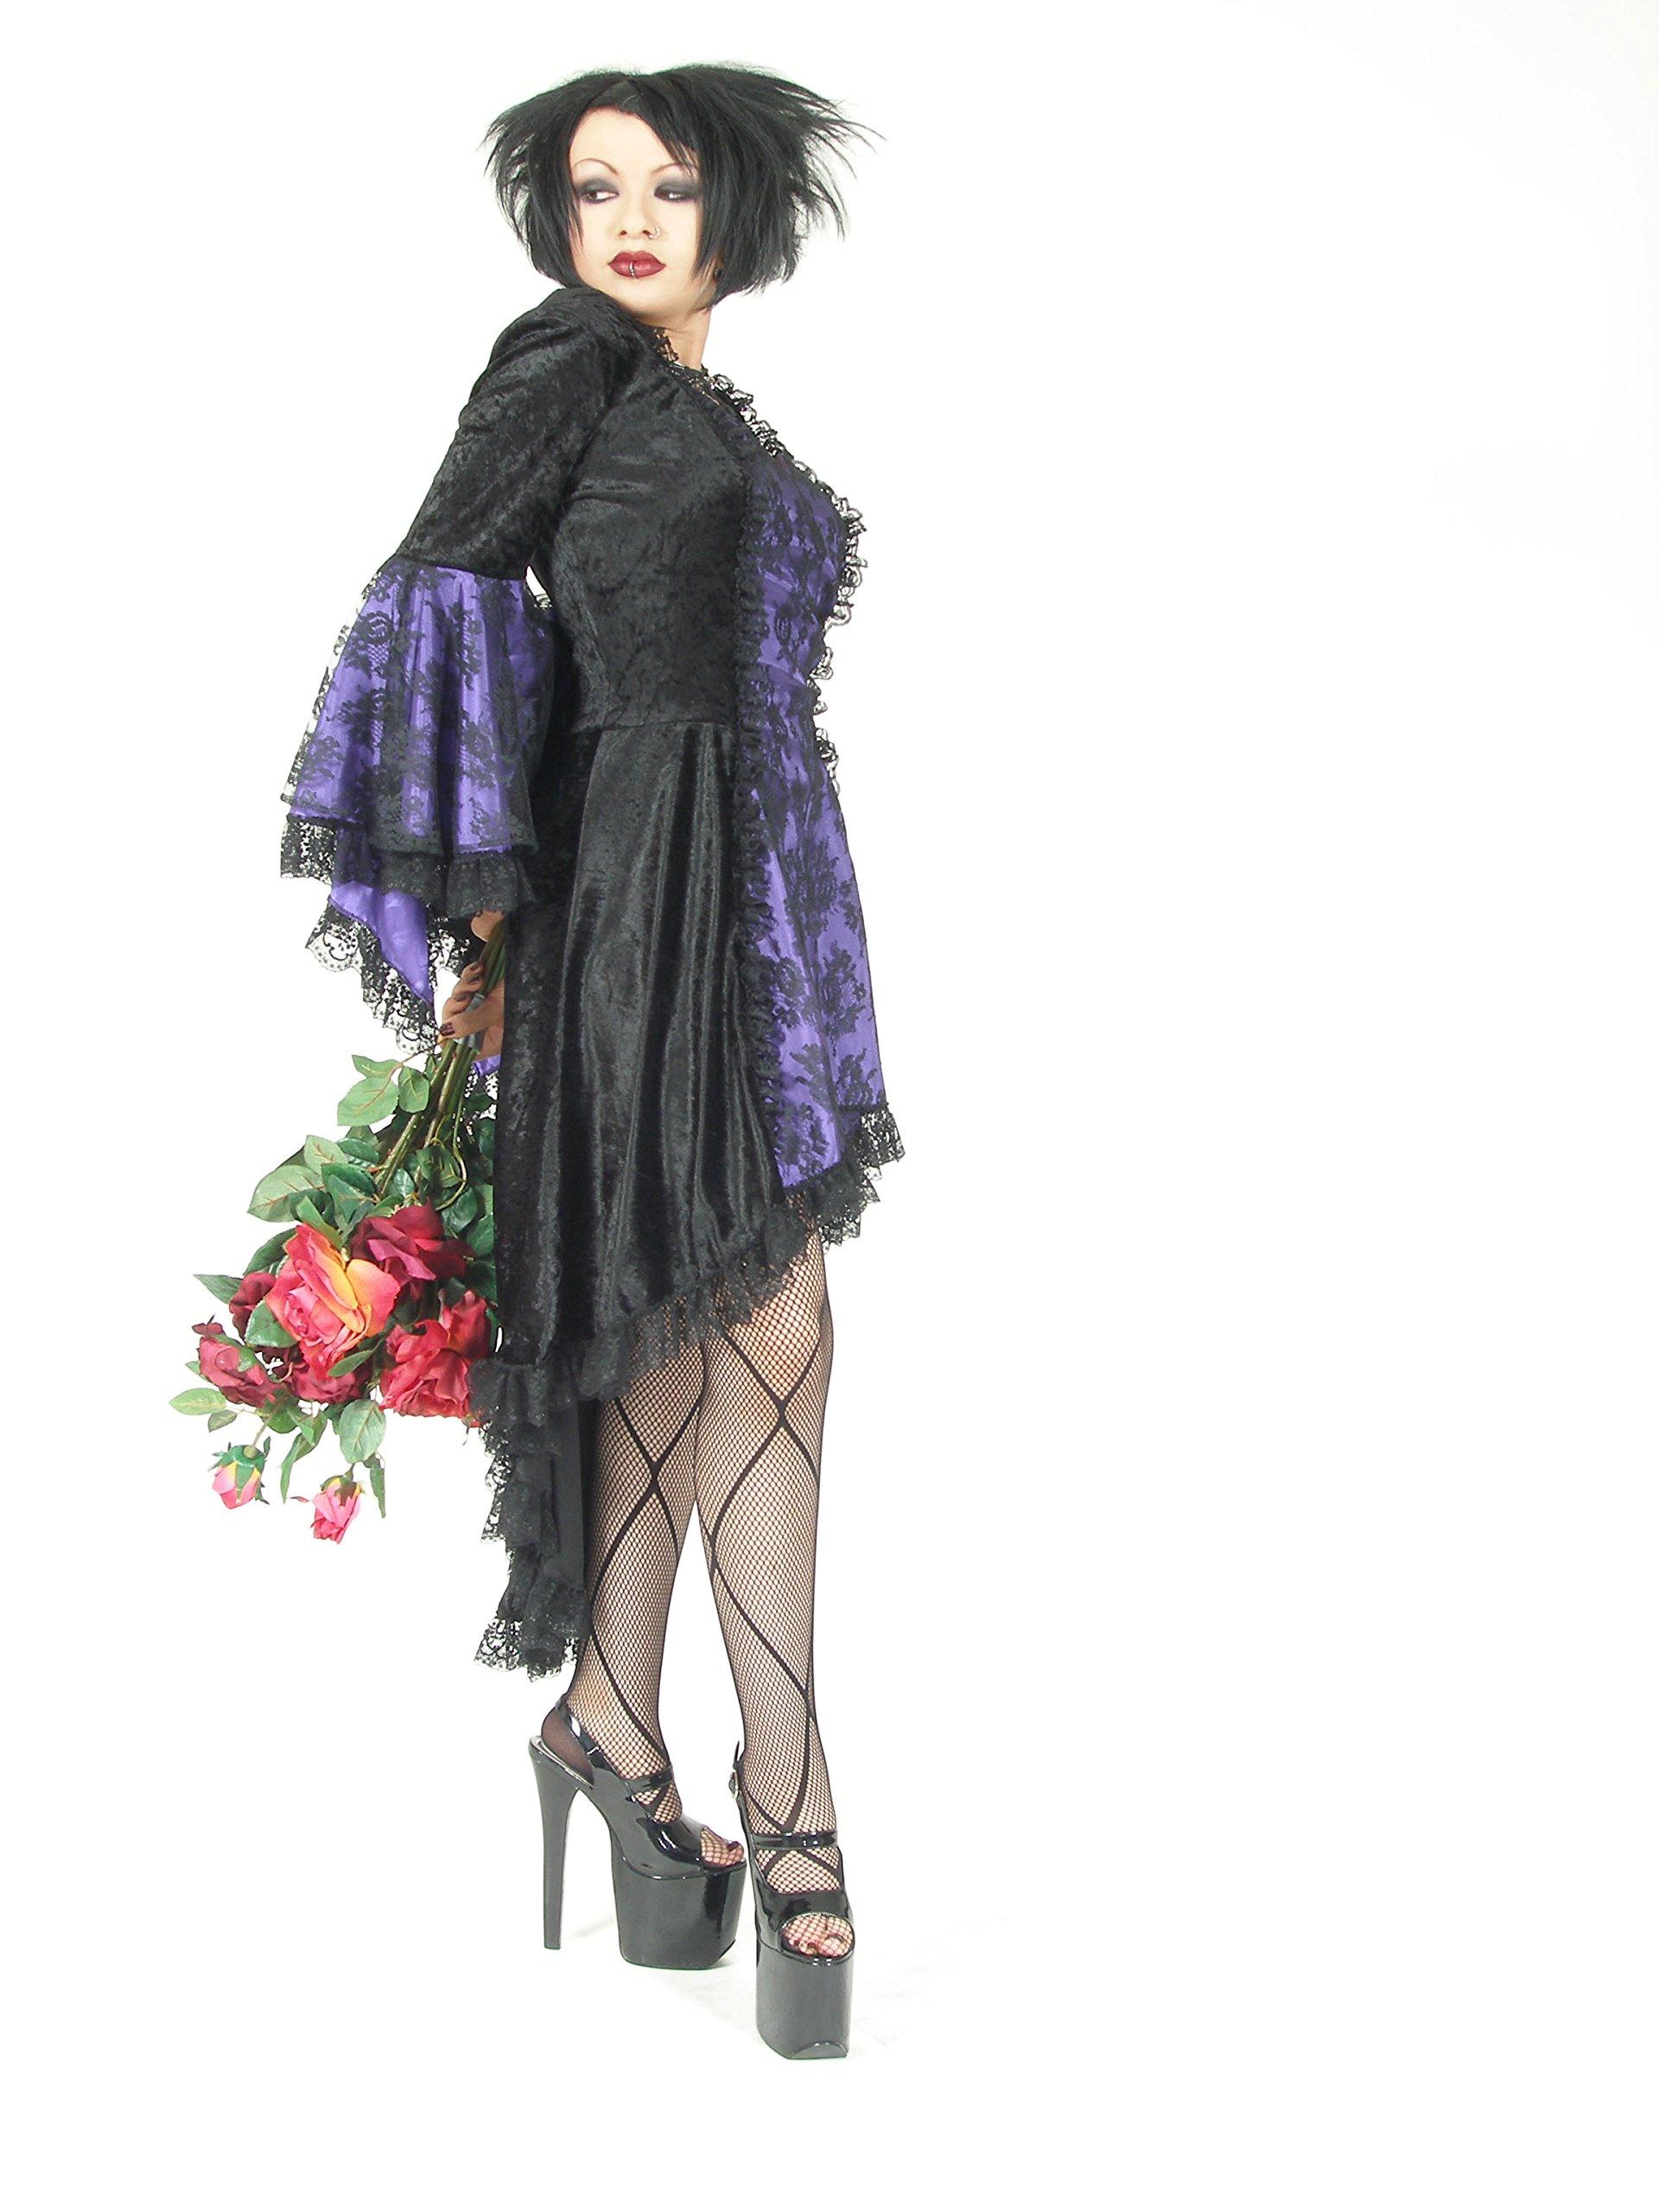 Eternal Love Plus Size Black Violet Purple Gothic Gwendolyn Dress Taffeta Lace (5X)